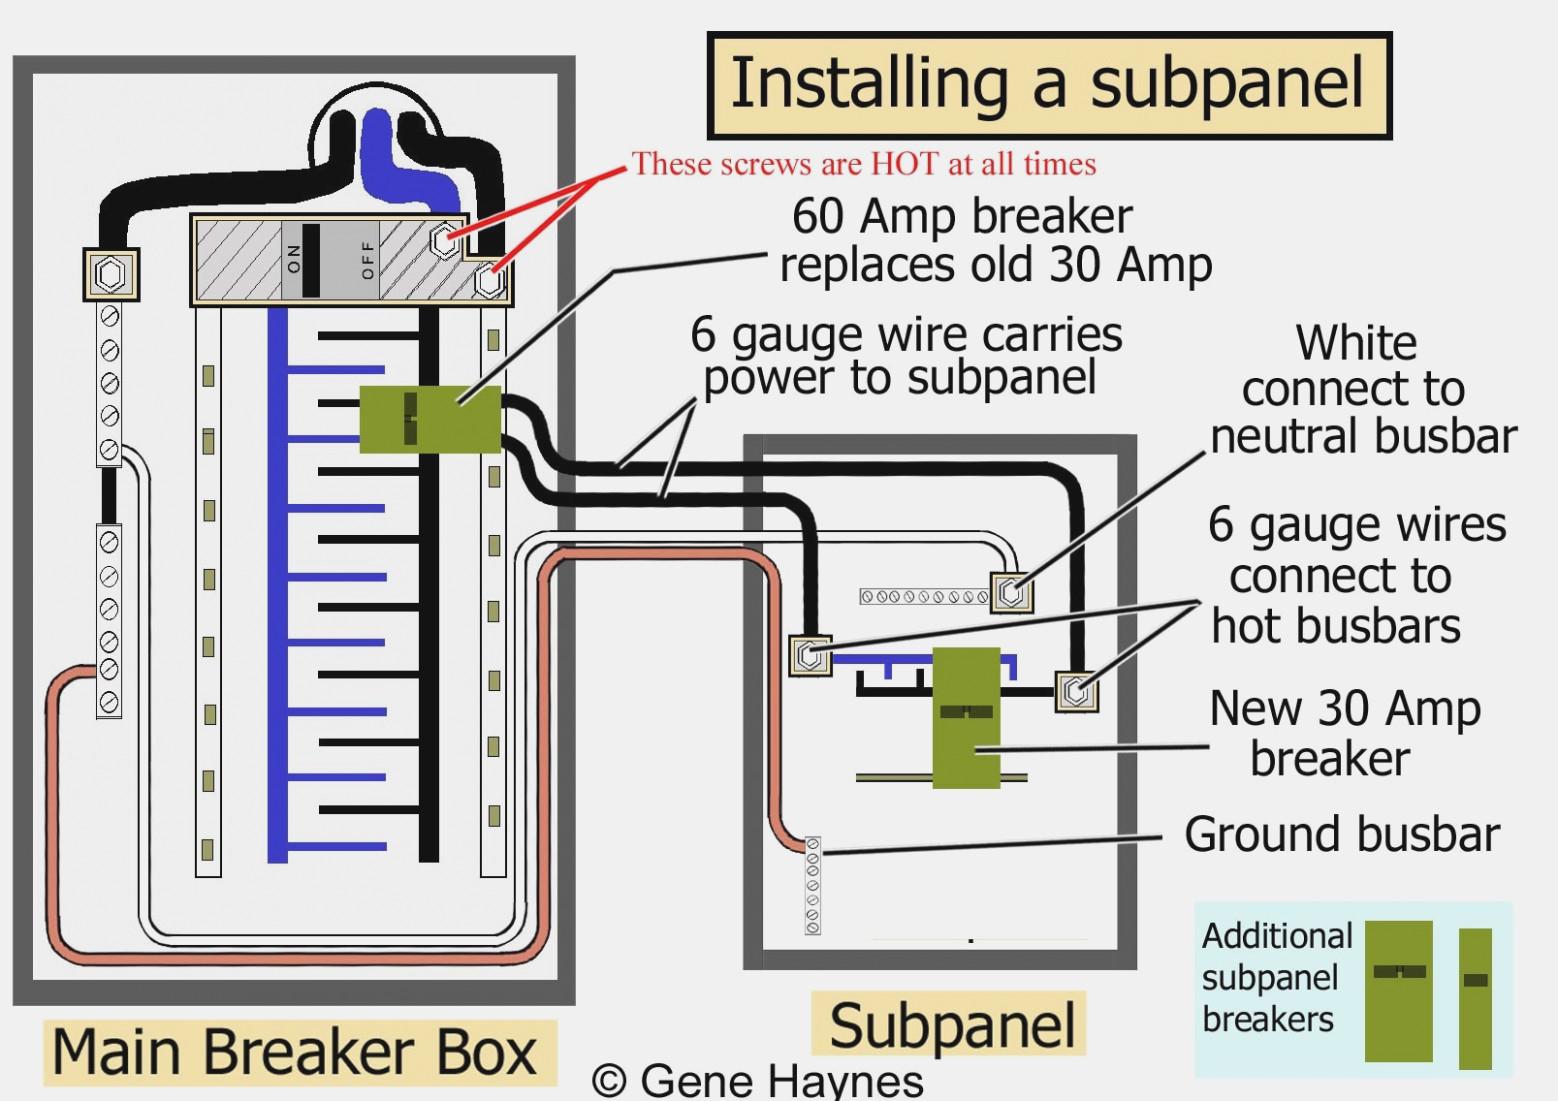 Square D 100 Amp Panel Wiring Diagram   Wiring Diagram - Square D 100 Amp Panel Wiring Diagram